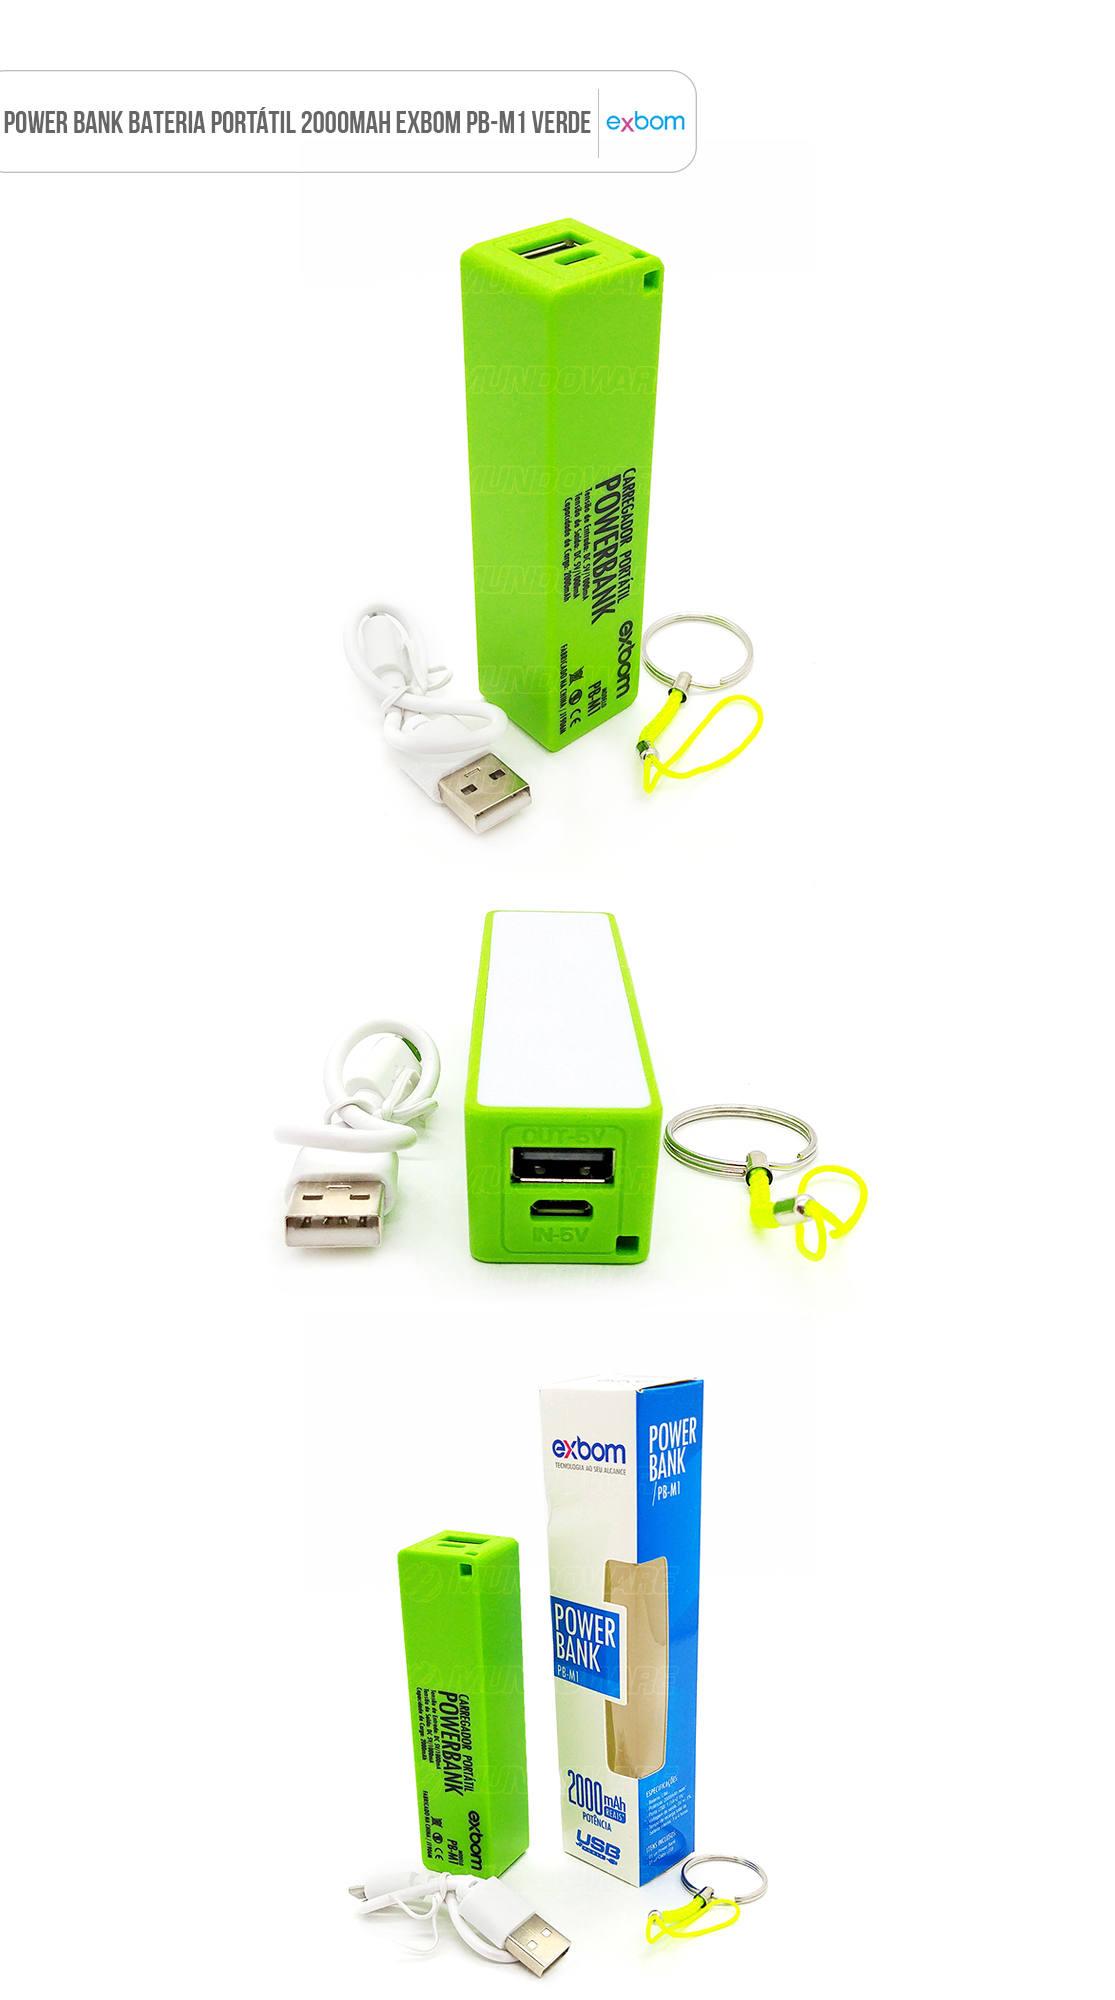 Power Bank Bateria Portátil 2000mAh Verde Exbom PB-M1